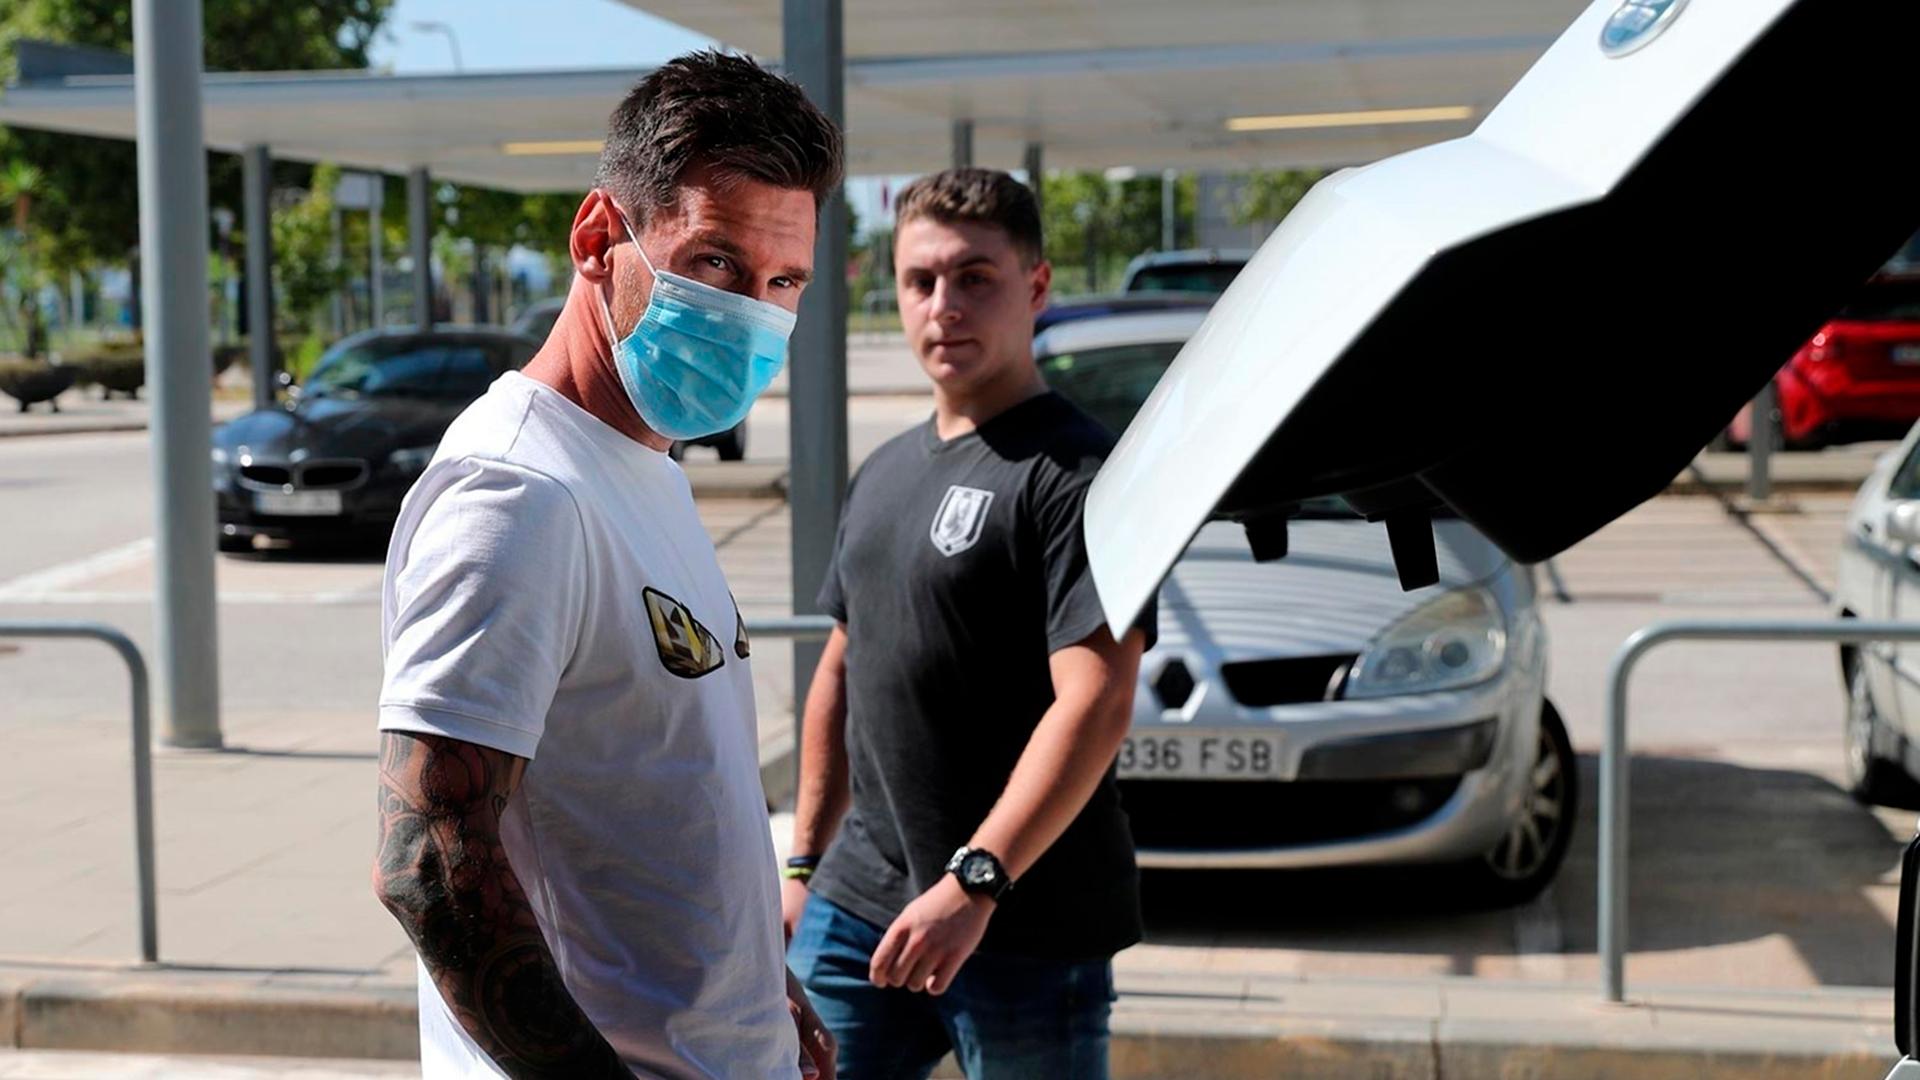 FC Barcelona's Lionel Messi arrives at Ciutat Esportiva Joan Gamper for COVID-19 tests following the outbreak of the coronavirus disease (COVID-19), Barcelona, Spain, May 6, 2020. REUTERS/Albert Gea